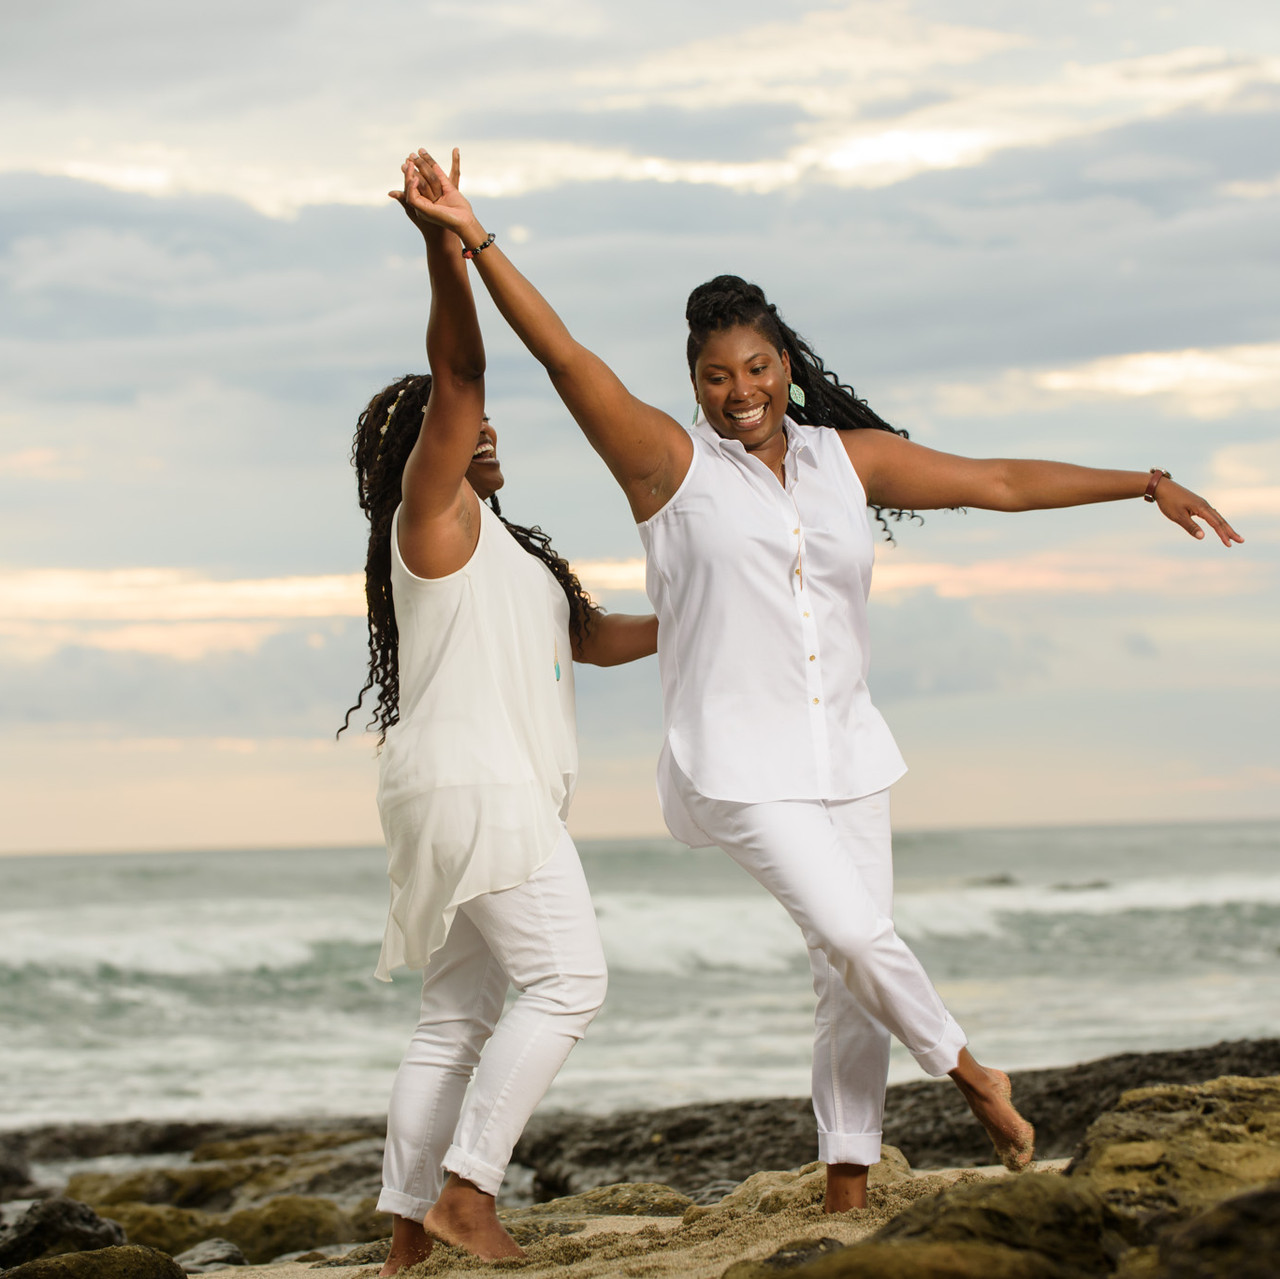 Loving life together at Playa Langosta